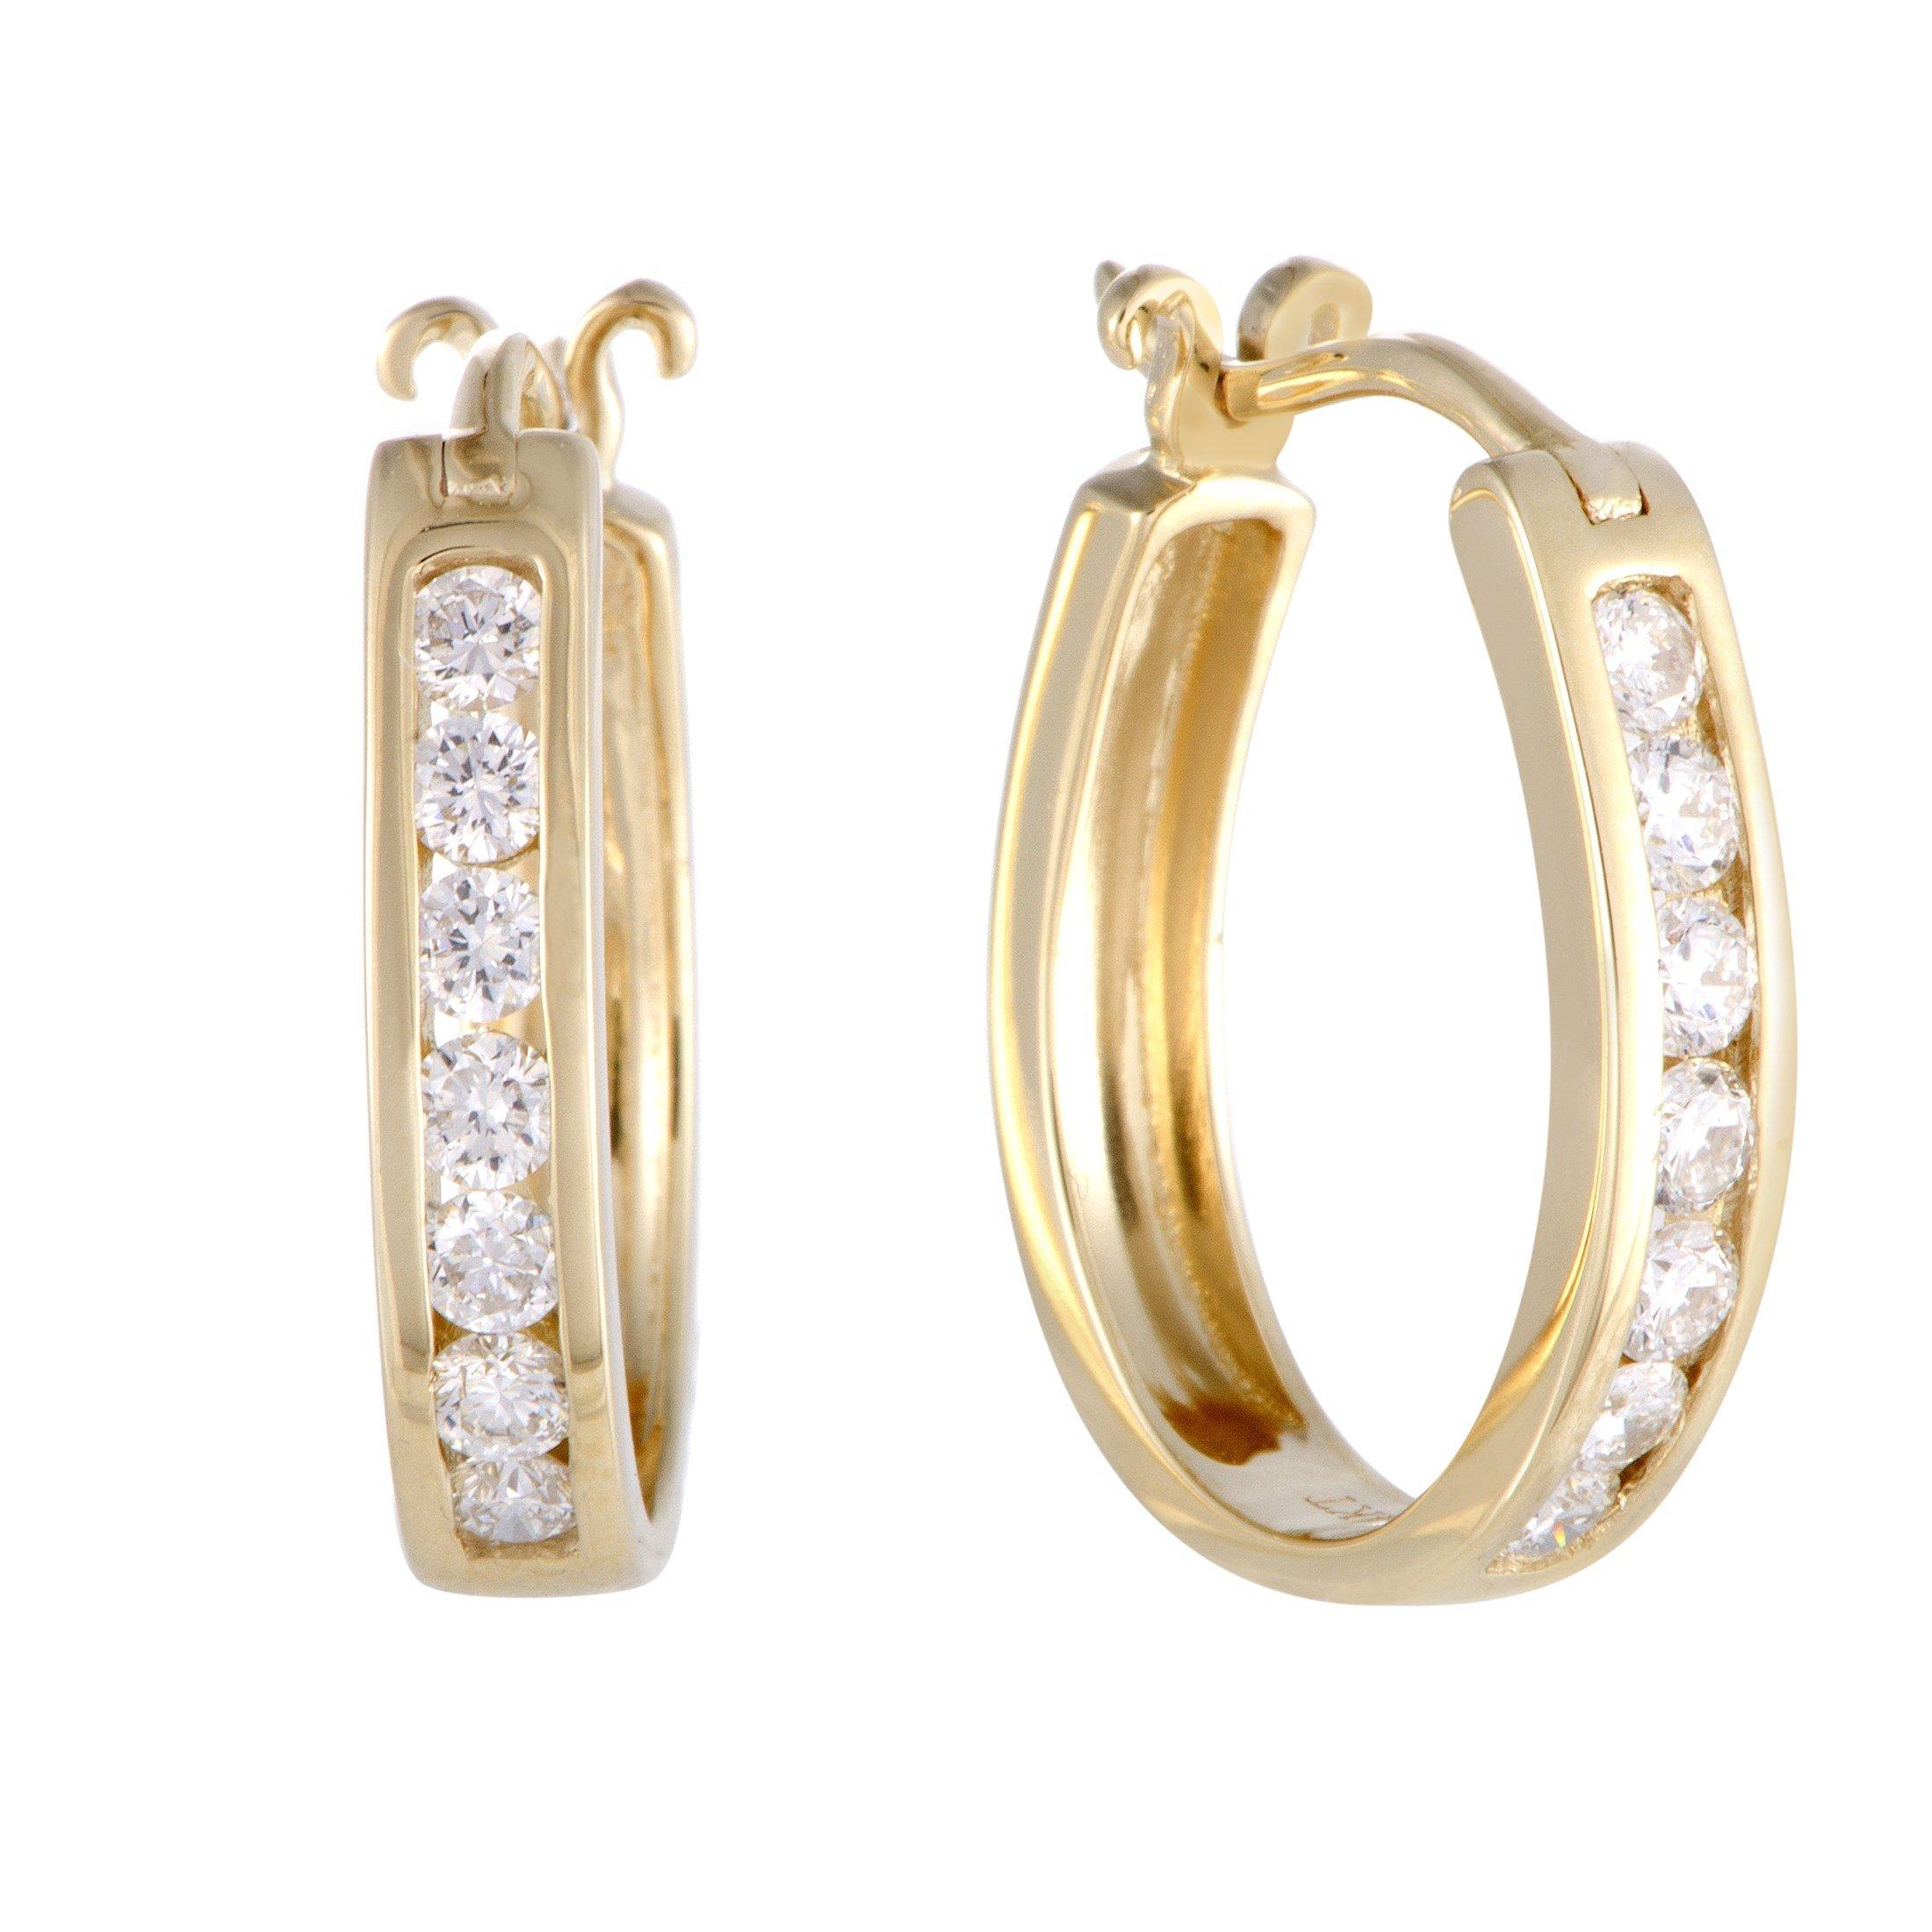 0.5 Carat (ctw) Diamond Channel Horseshoe Hoop Earrings in 14K Yellow Gold; 1/2 CT White Diamonds (G Color, SI1-SI2 Clarity) in 0.75'' Hoops by Luxury Bazaar (Image #1)